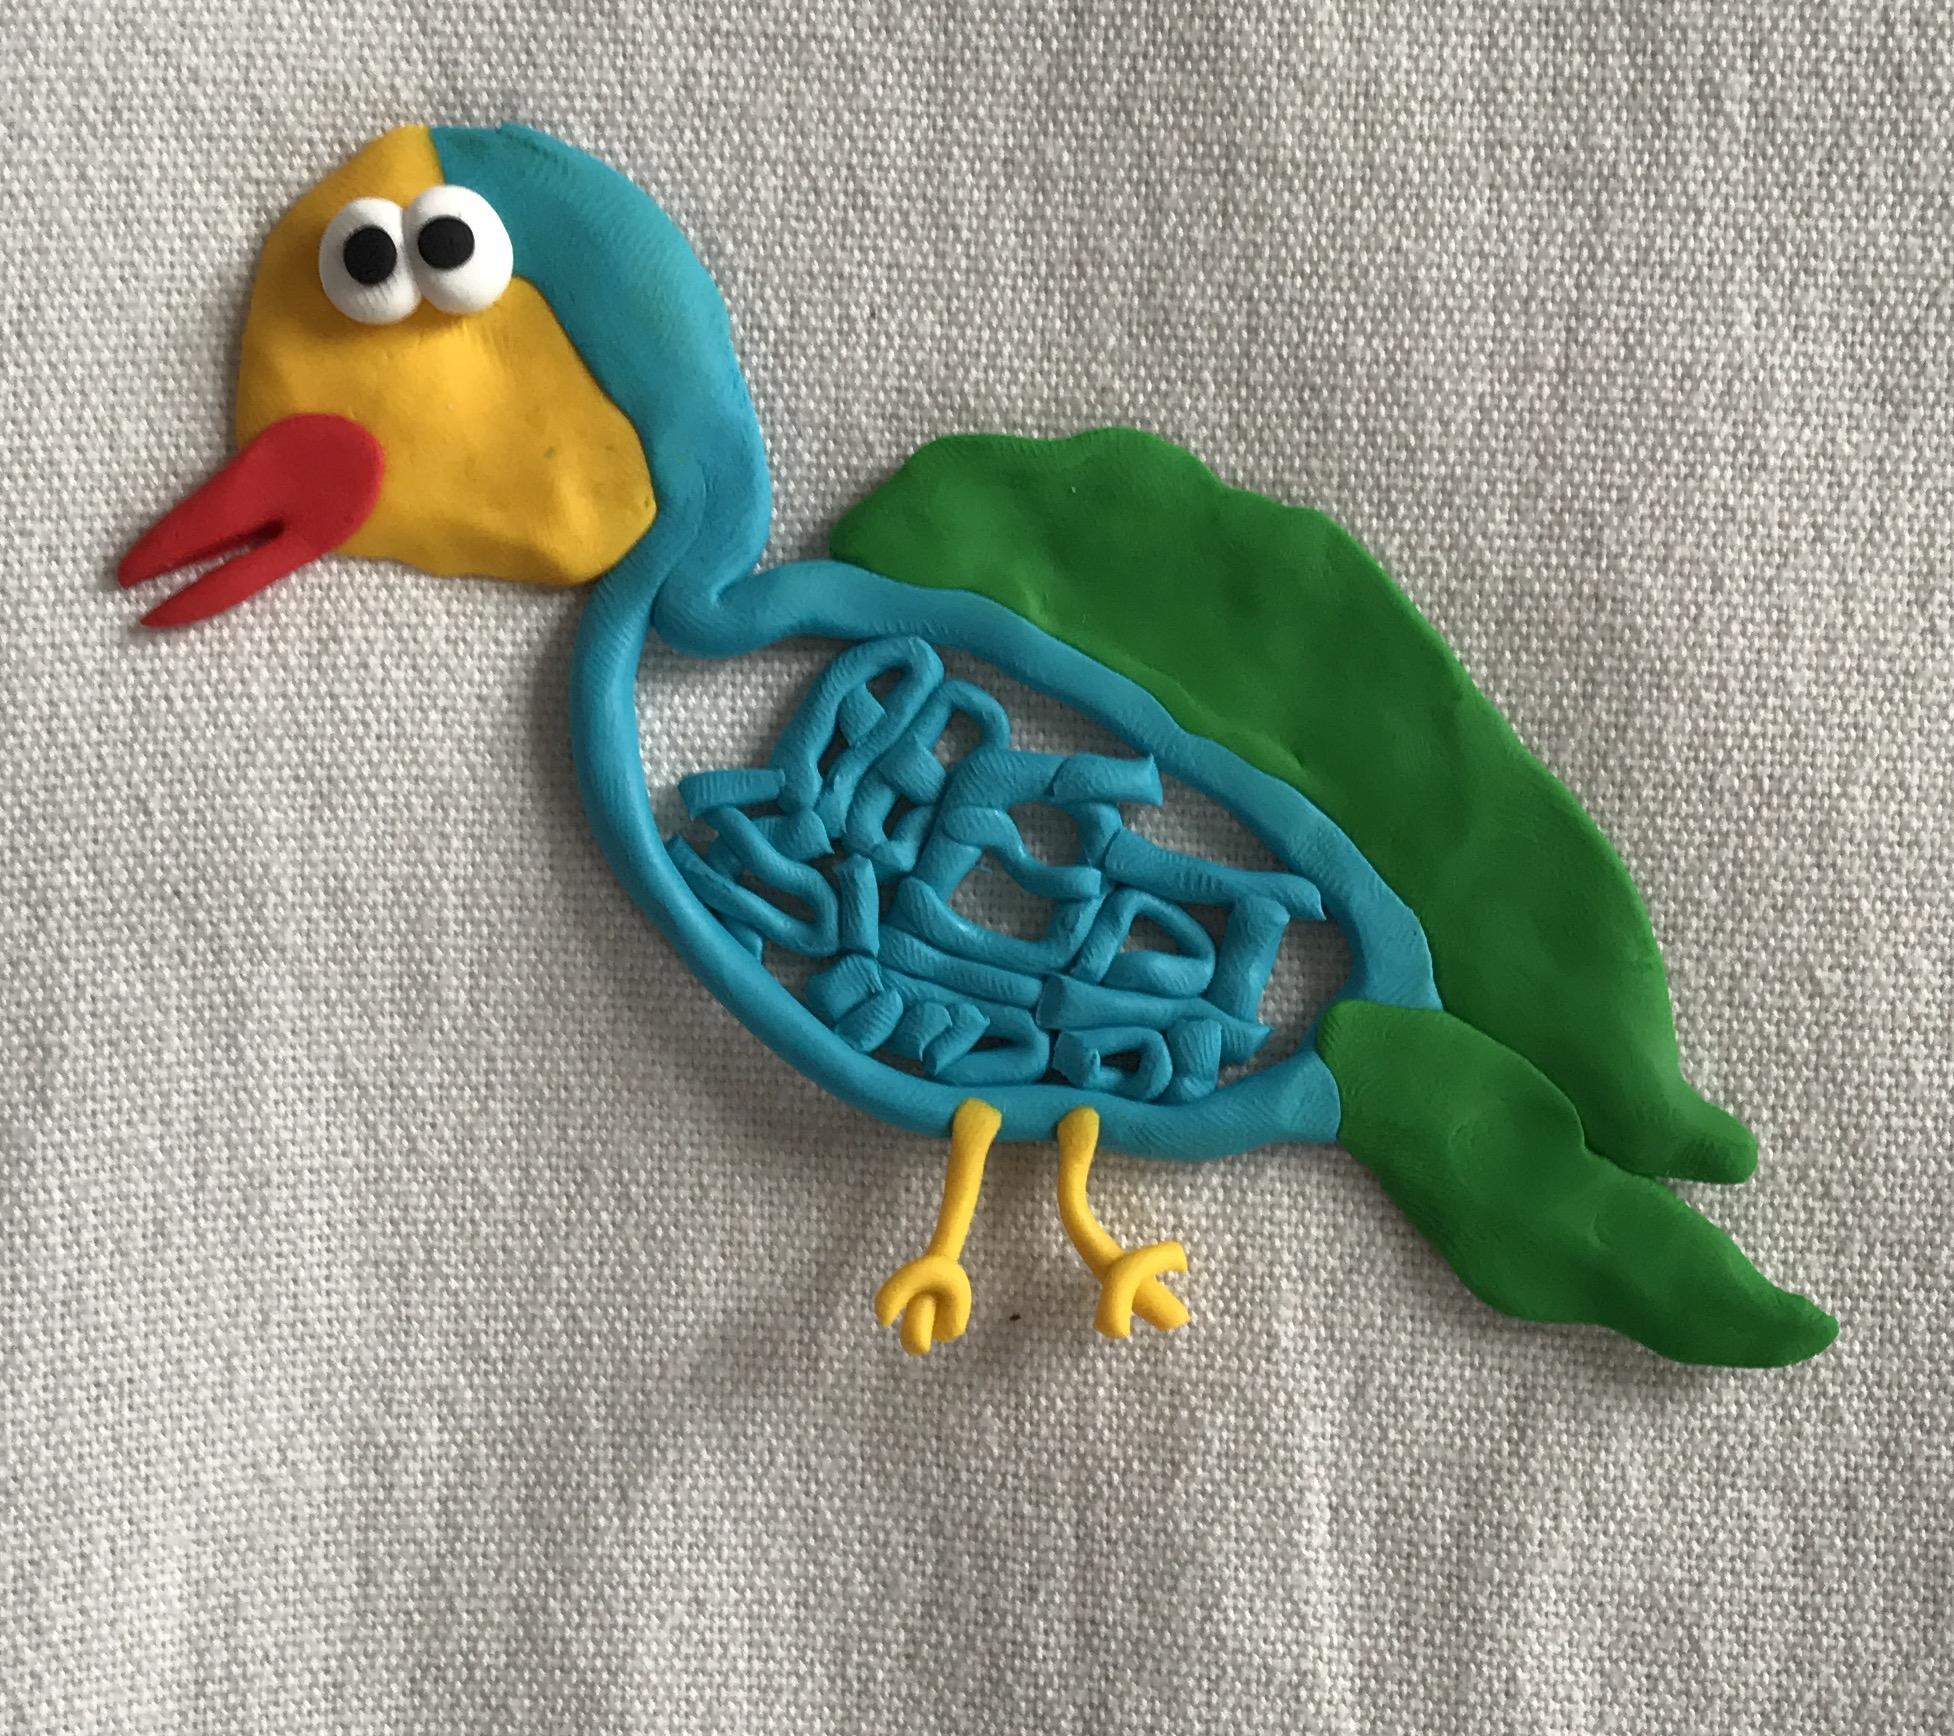 インコ 鸚哥 鳥 日本語 粘土 美術品 parakeet bird art calligraphy Japanese clay